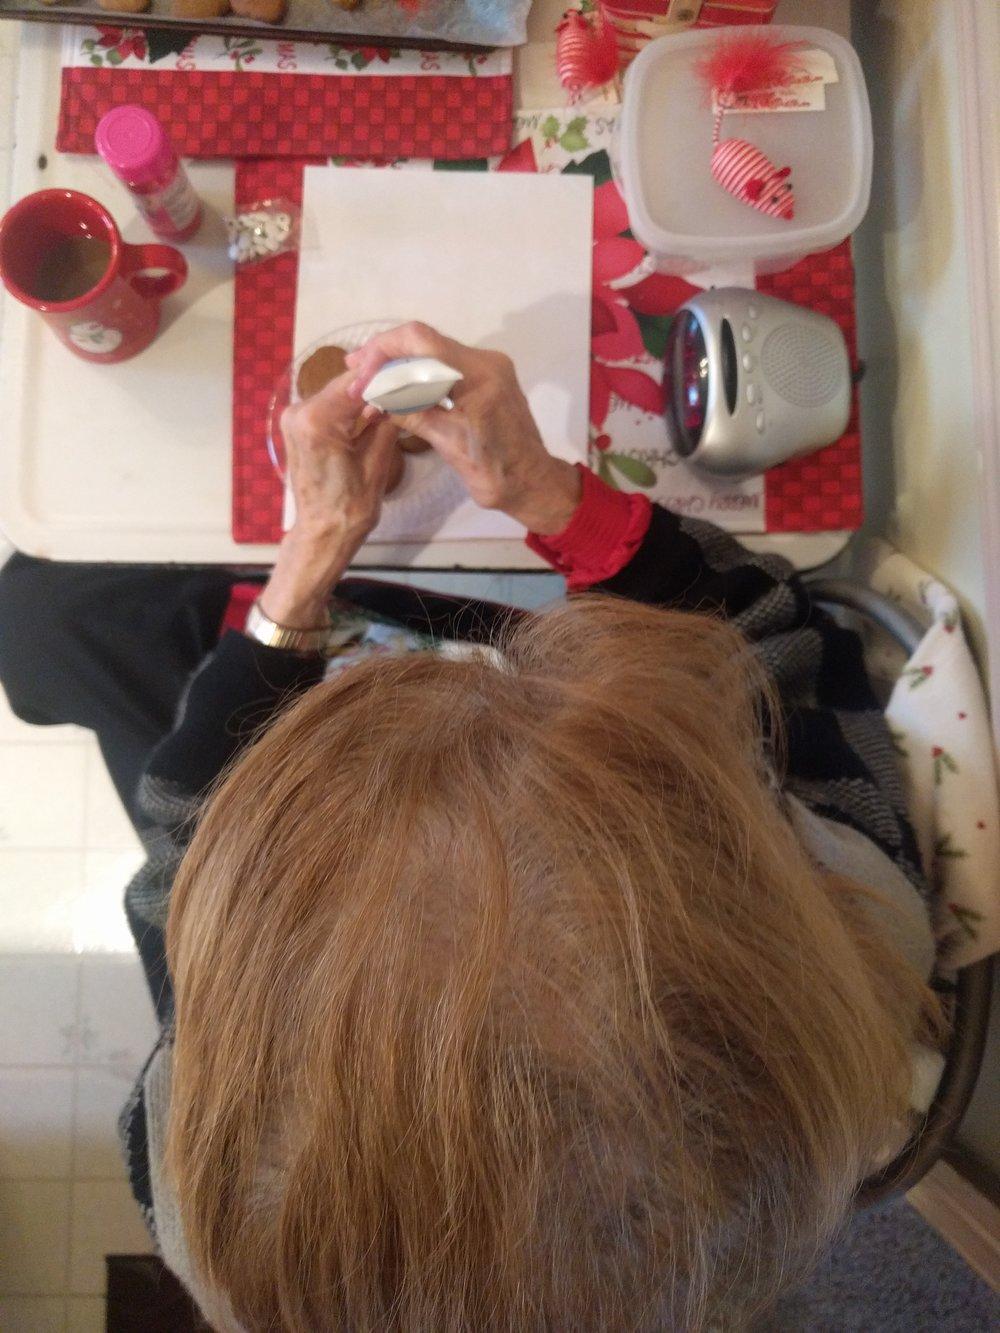 Nannie decorating her gingerbread man